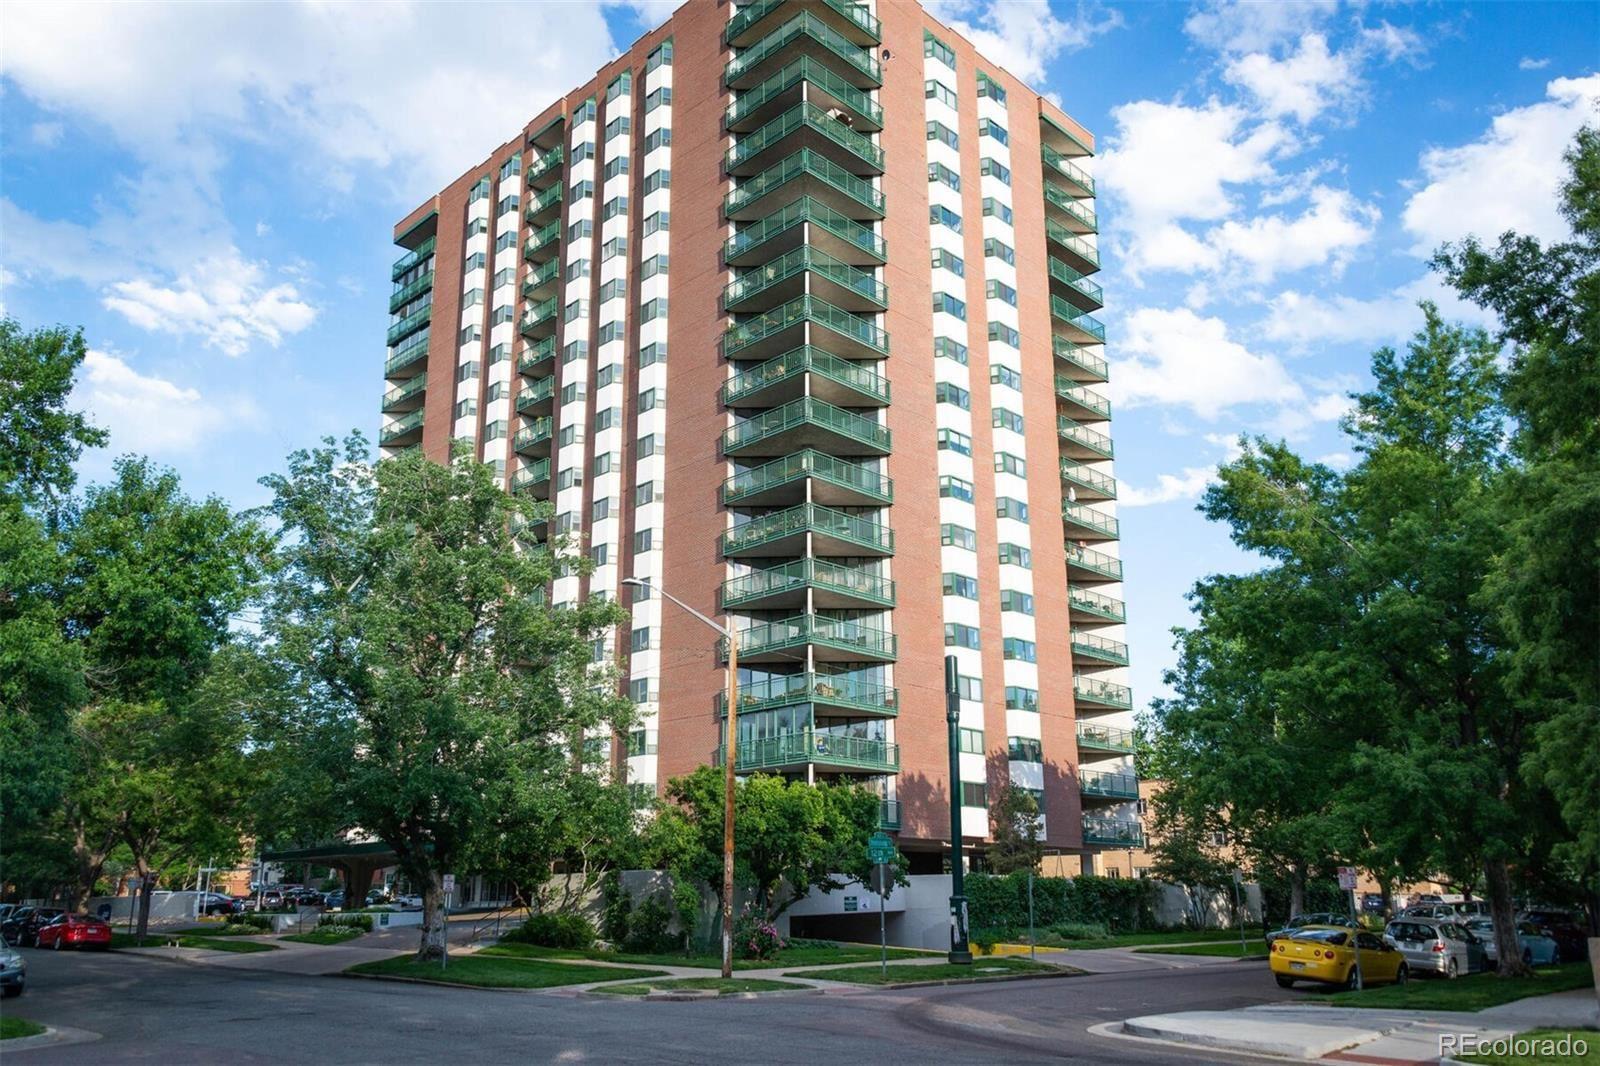 Photo of 550 E 12th Avenue #1701, Denver, CO 80203 (MLS # 1556666)